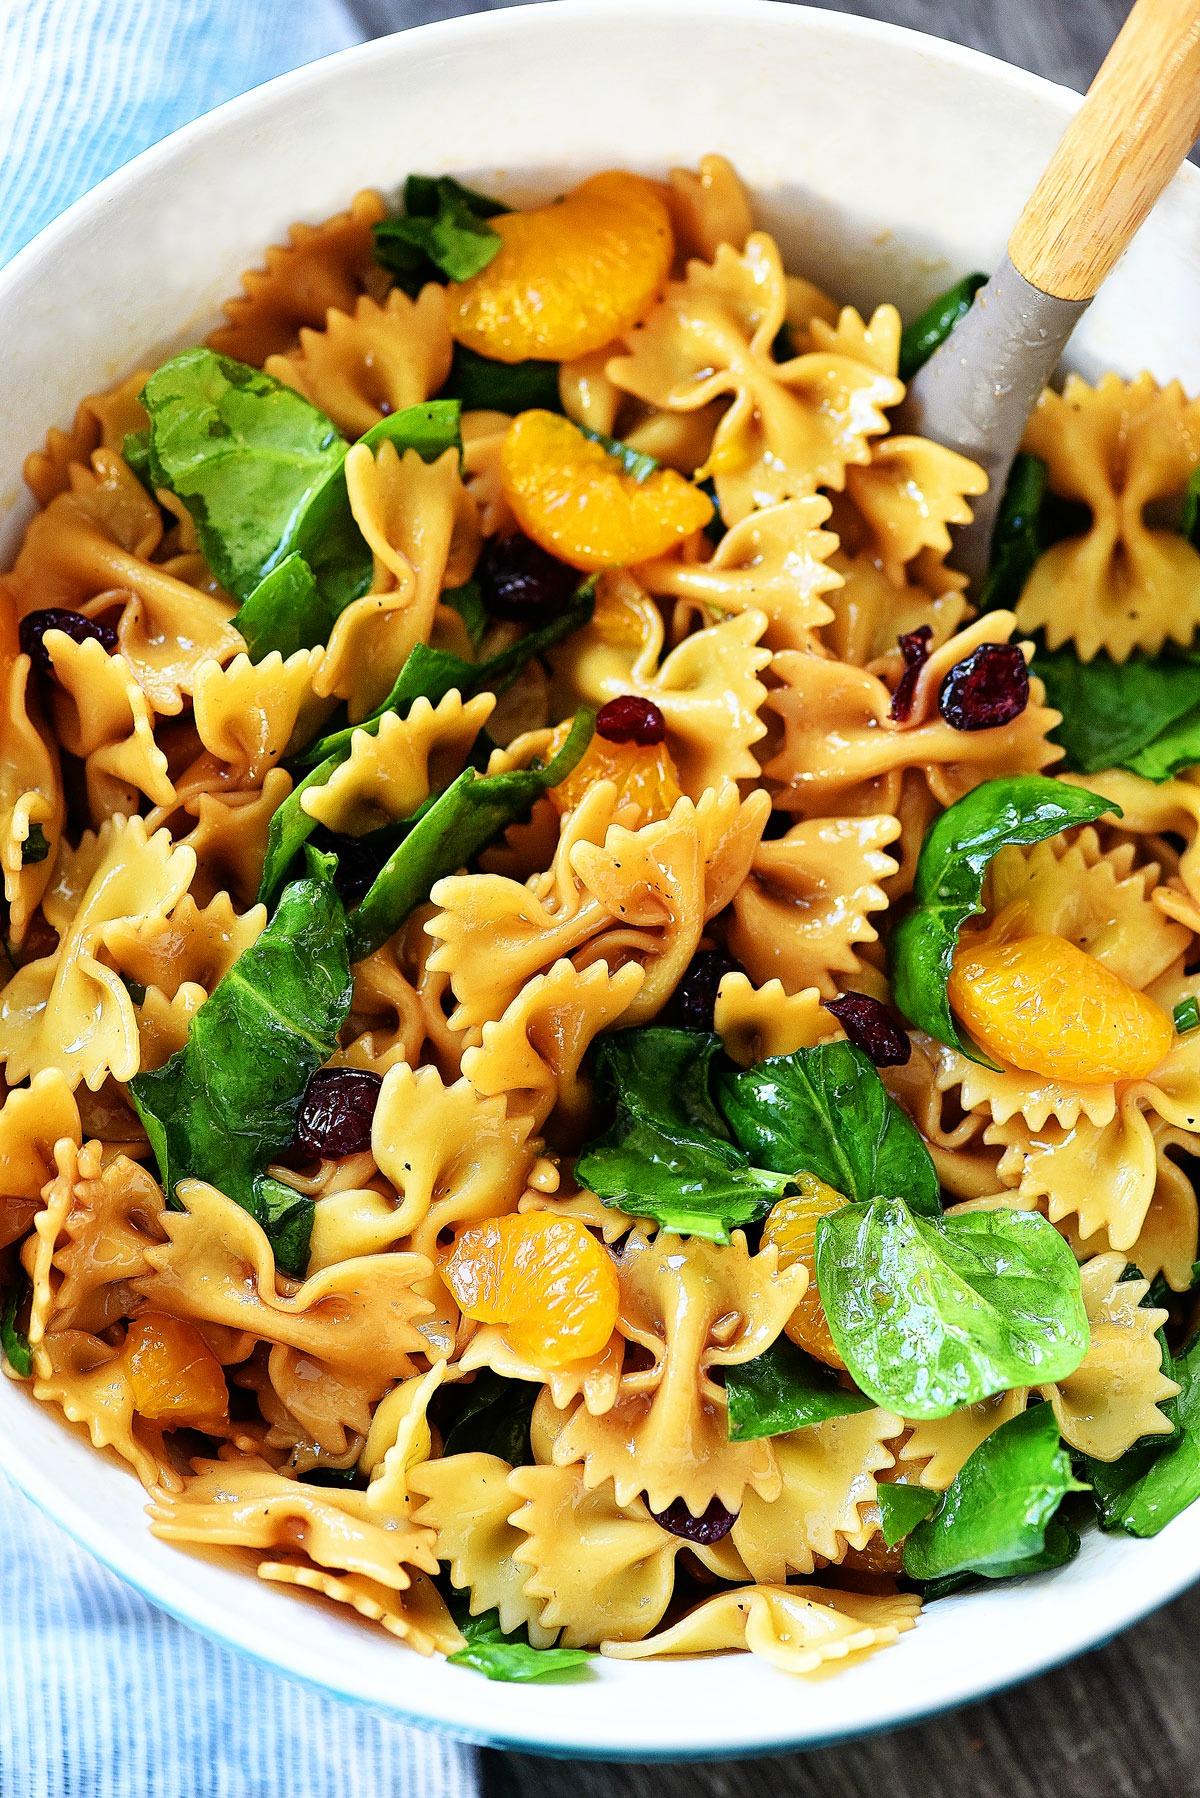 Mandarin Orange Spinach Pasta Salad